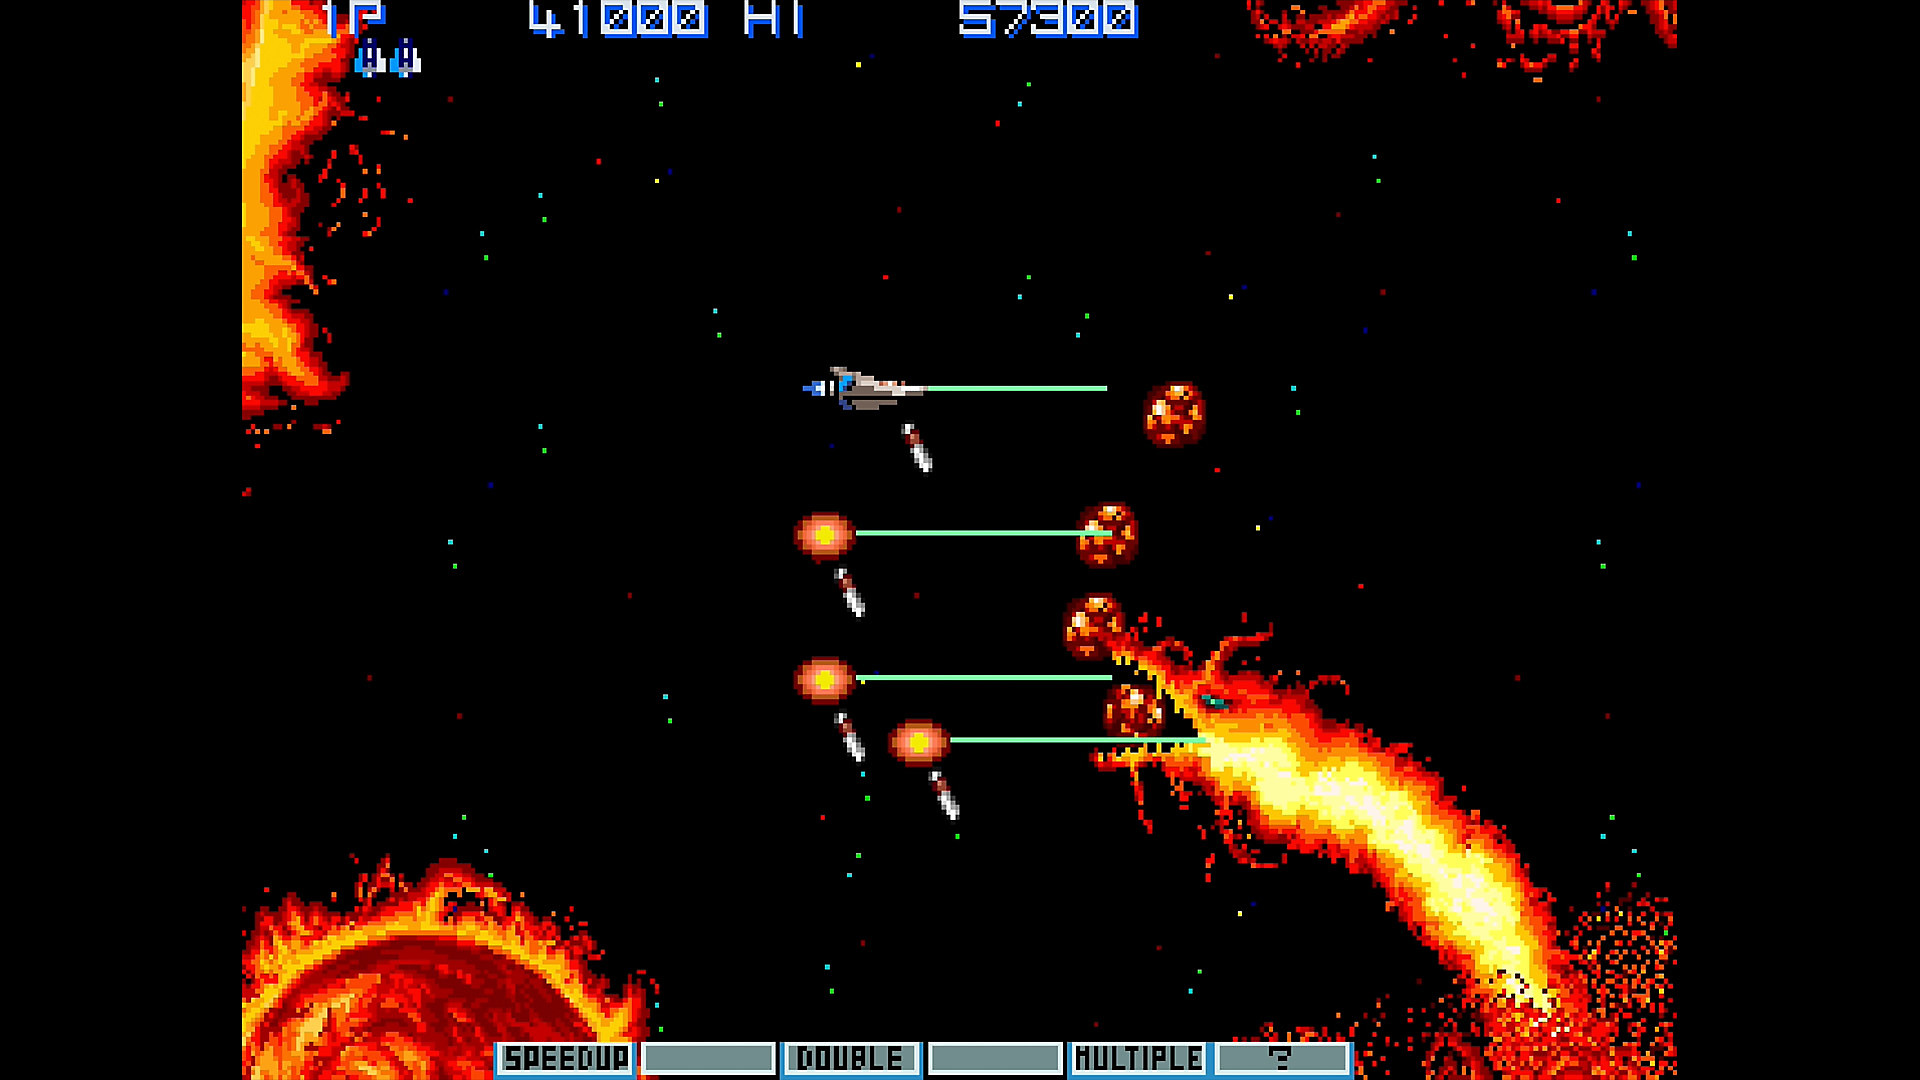 anniversary-collection-arcade-classics-screenshot-08-ps4-us-18apr2019